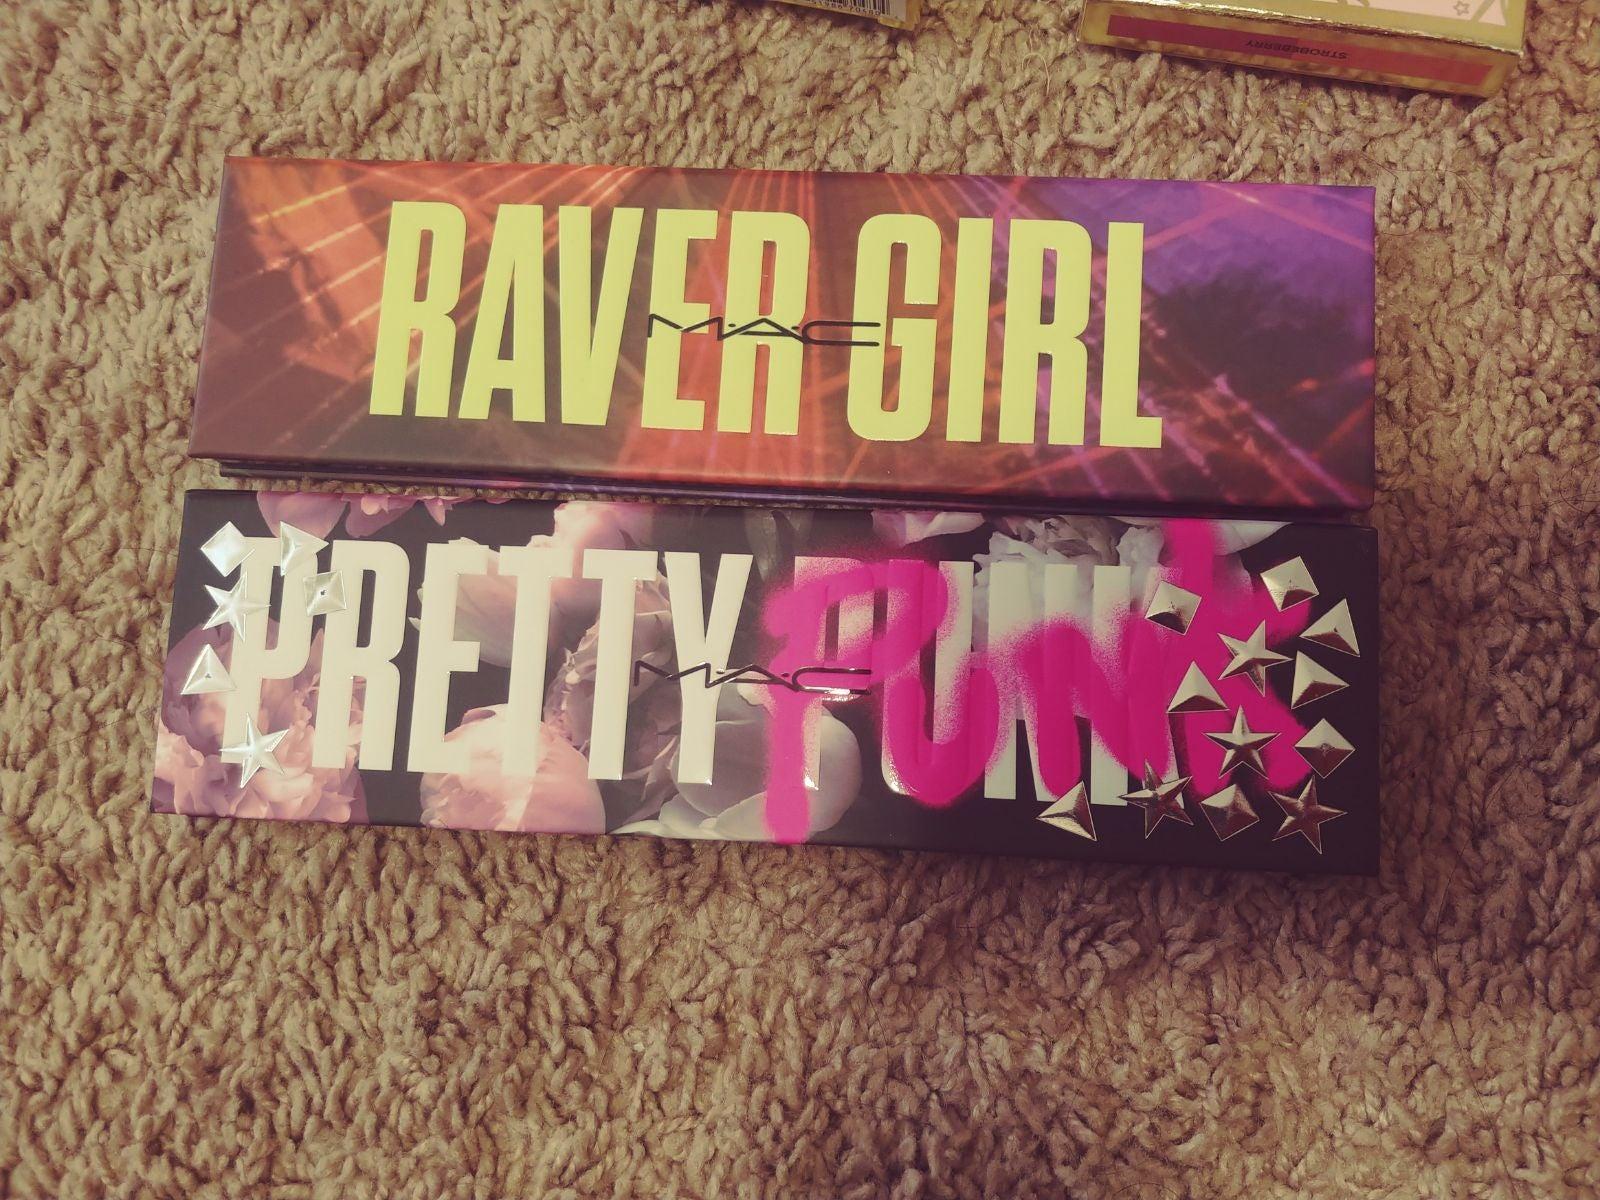 New MAC Raver Girl and pretty punk